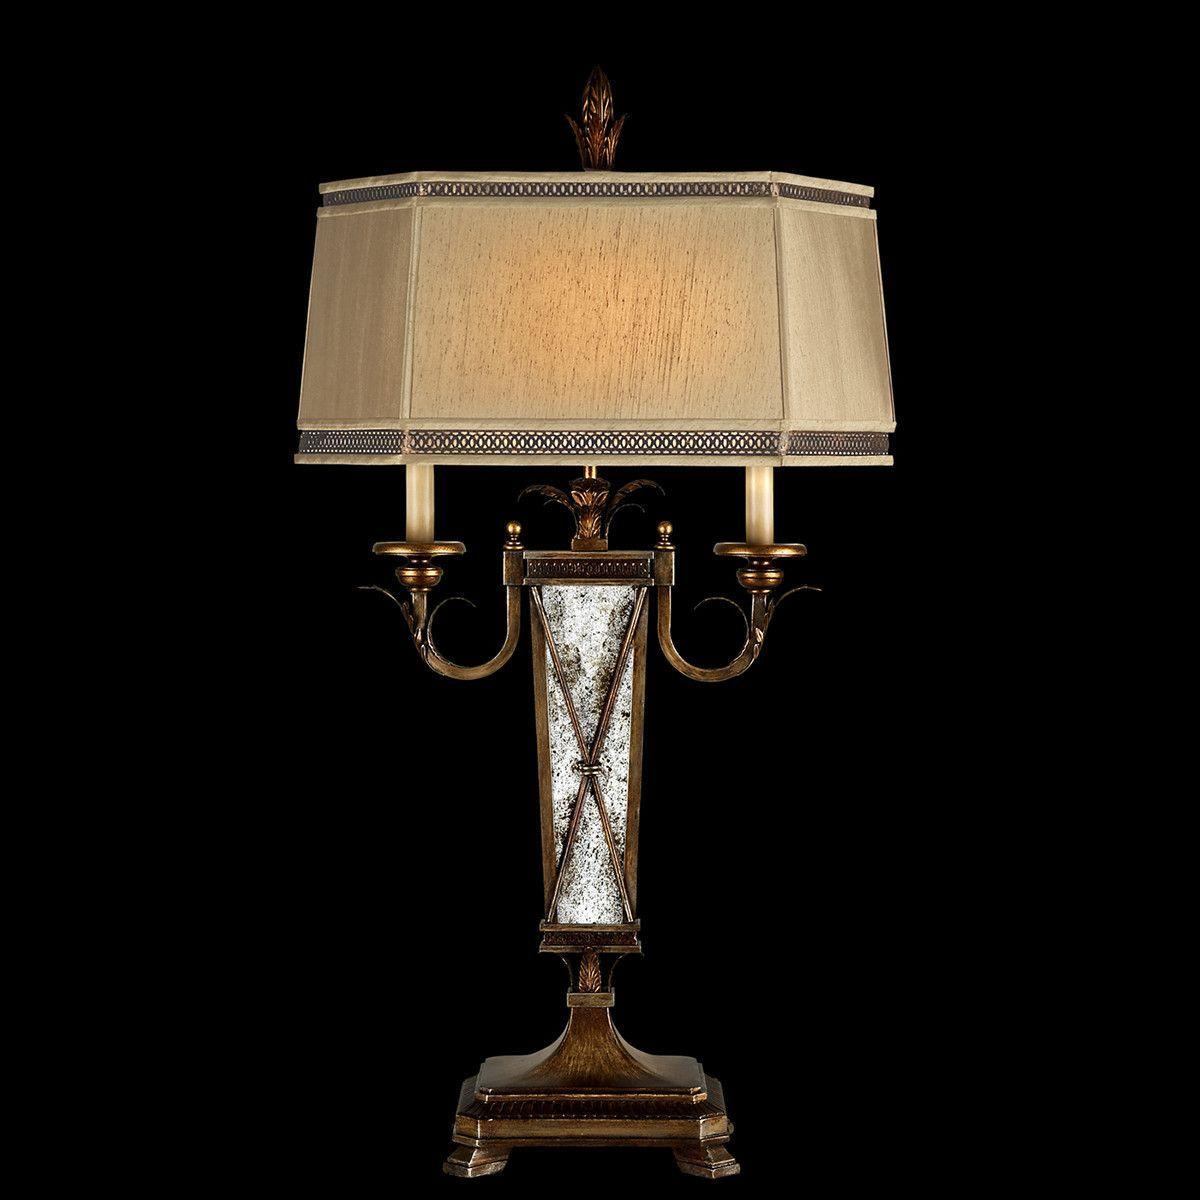 Fine art lamps newport 2 light table lamp products pinterest fine art lamps newport 2 light table lamp aloadofball Images